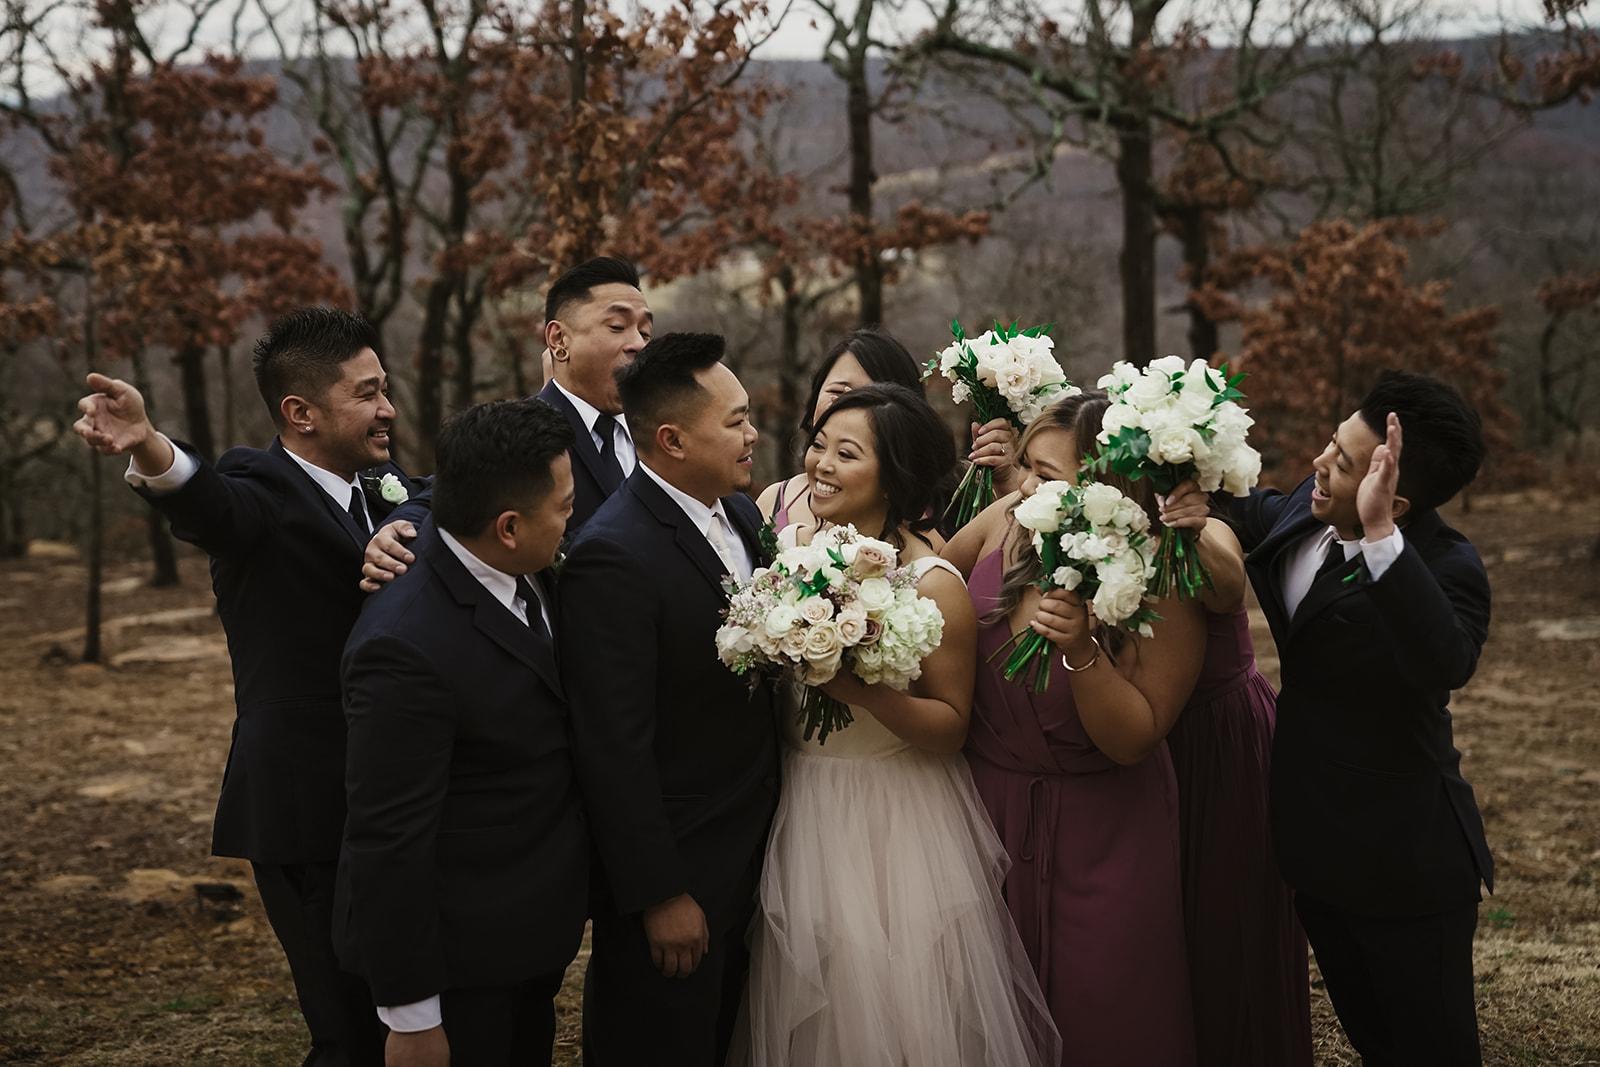 Bixby Tulsa White Barn Wedding Venues 17c.jpg